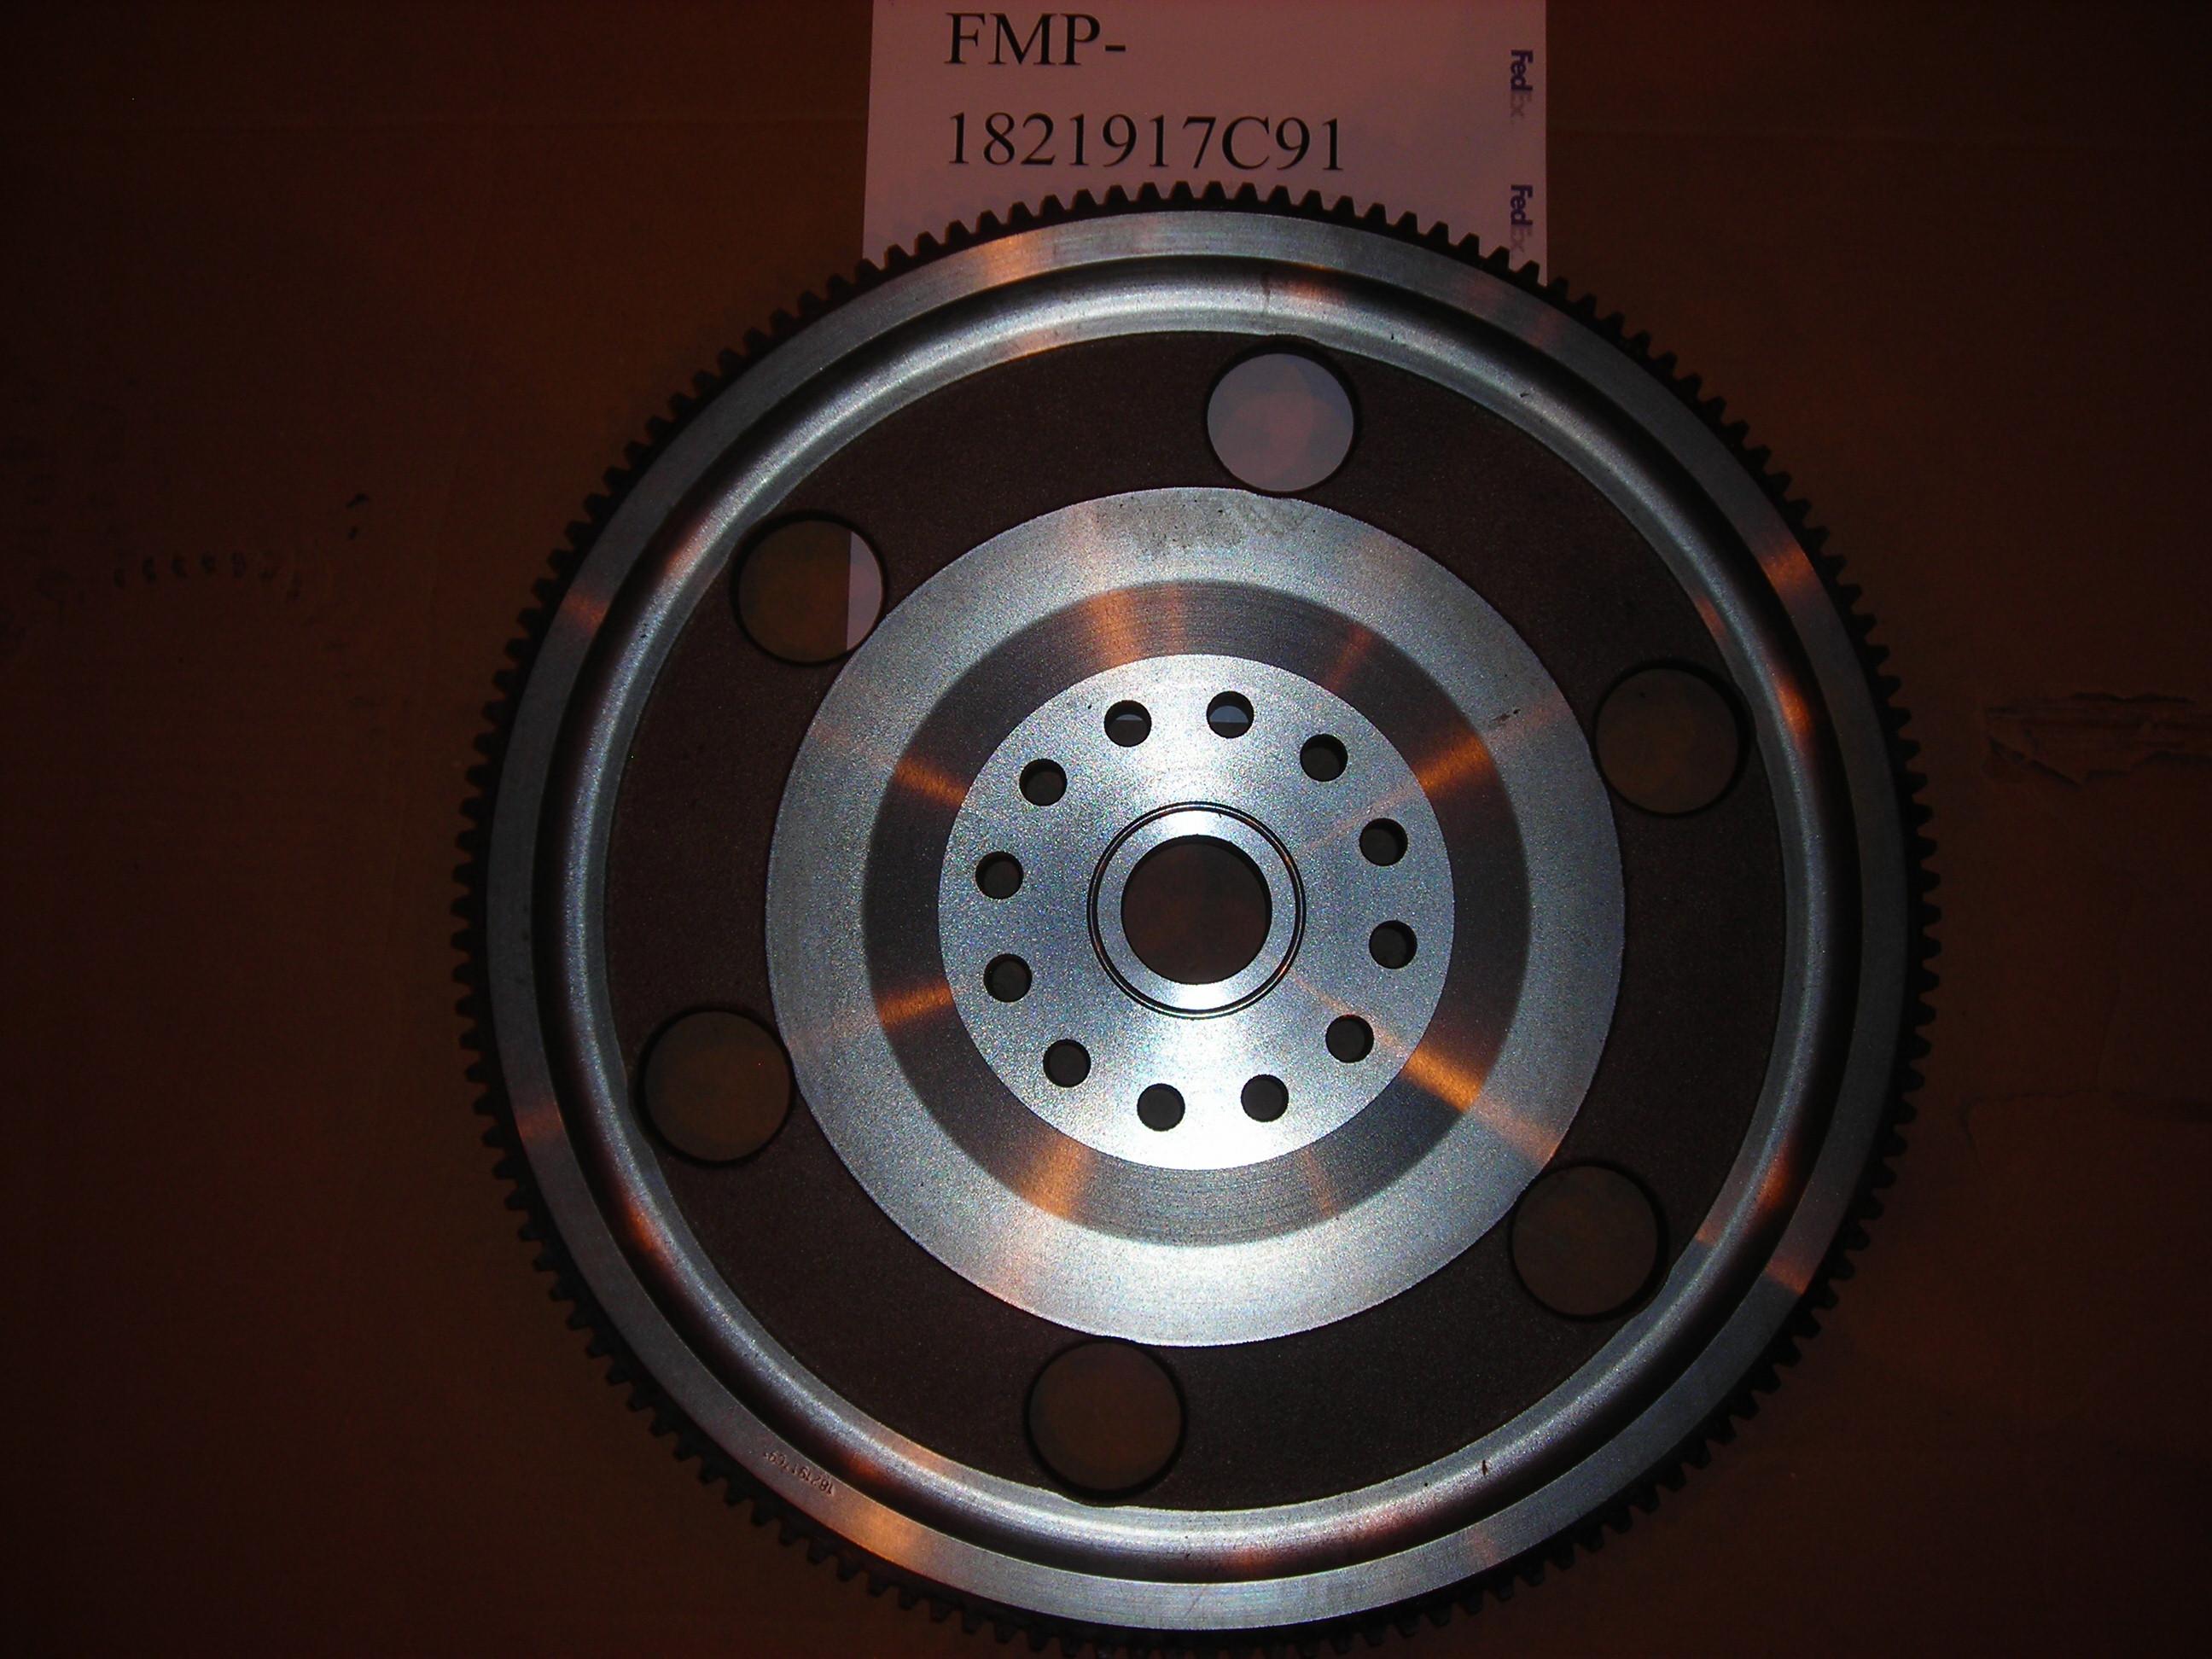 1821917C91 Navistar International Flywheel Front